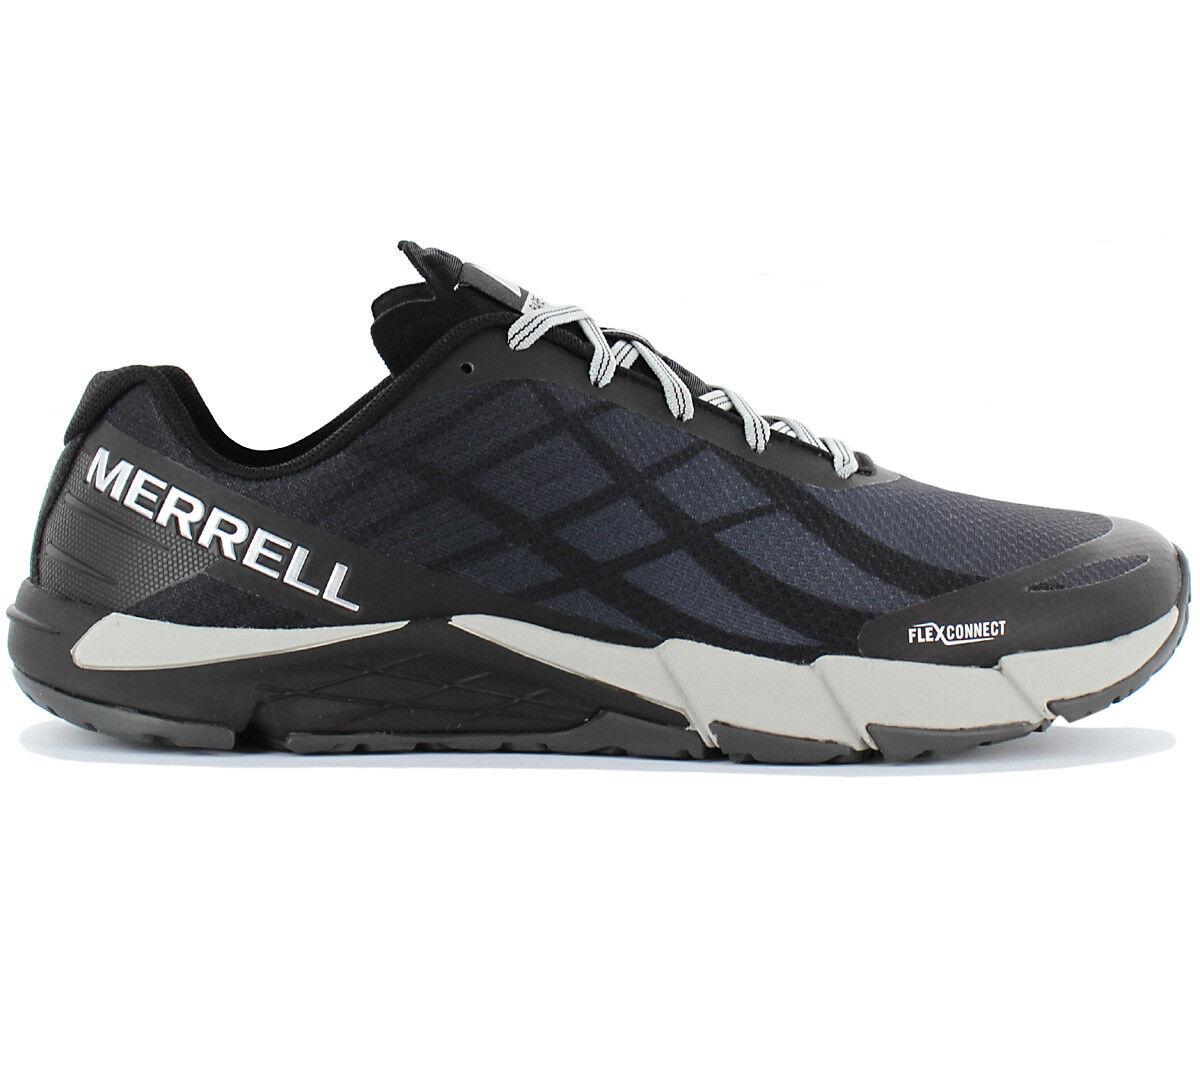 Merrell Bare Access Flex Walking Herren Schuhe Trail Wanderschuhe Walking Flex J09657 NEU 51f854